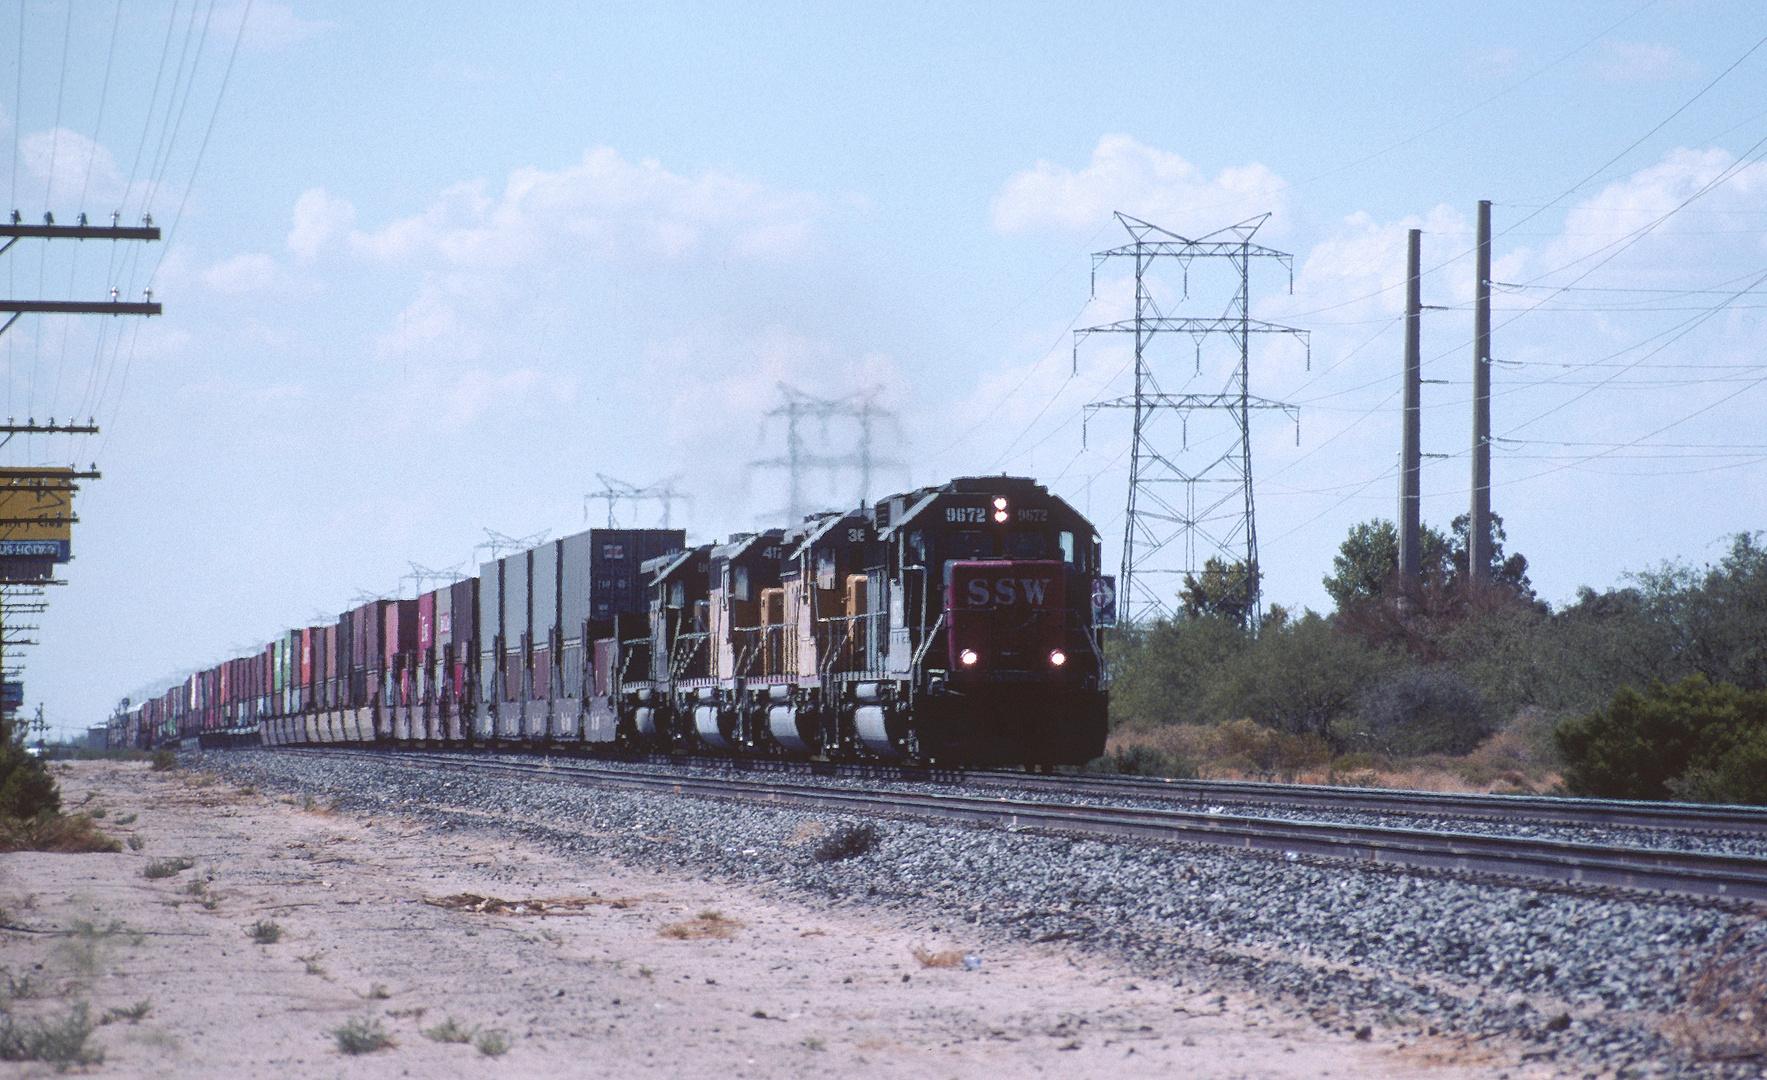 Union Pacific Double Stack Train on its way near Tucson, AZ, USA